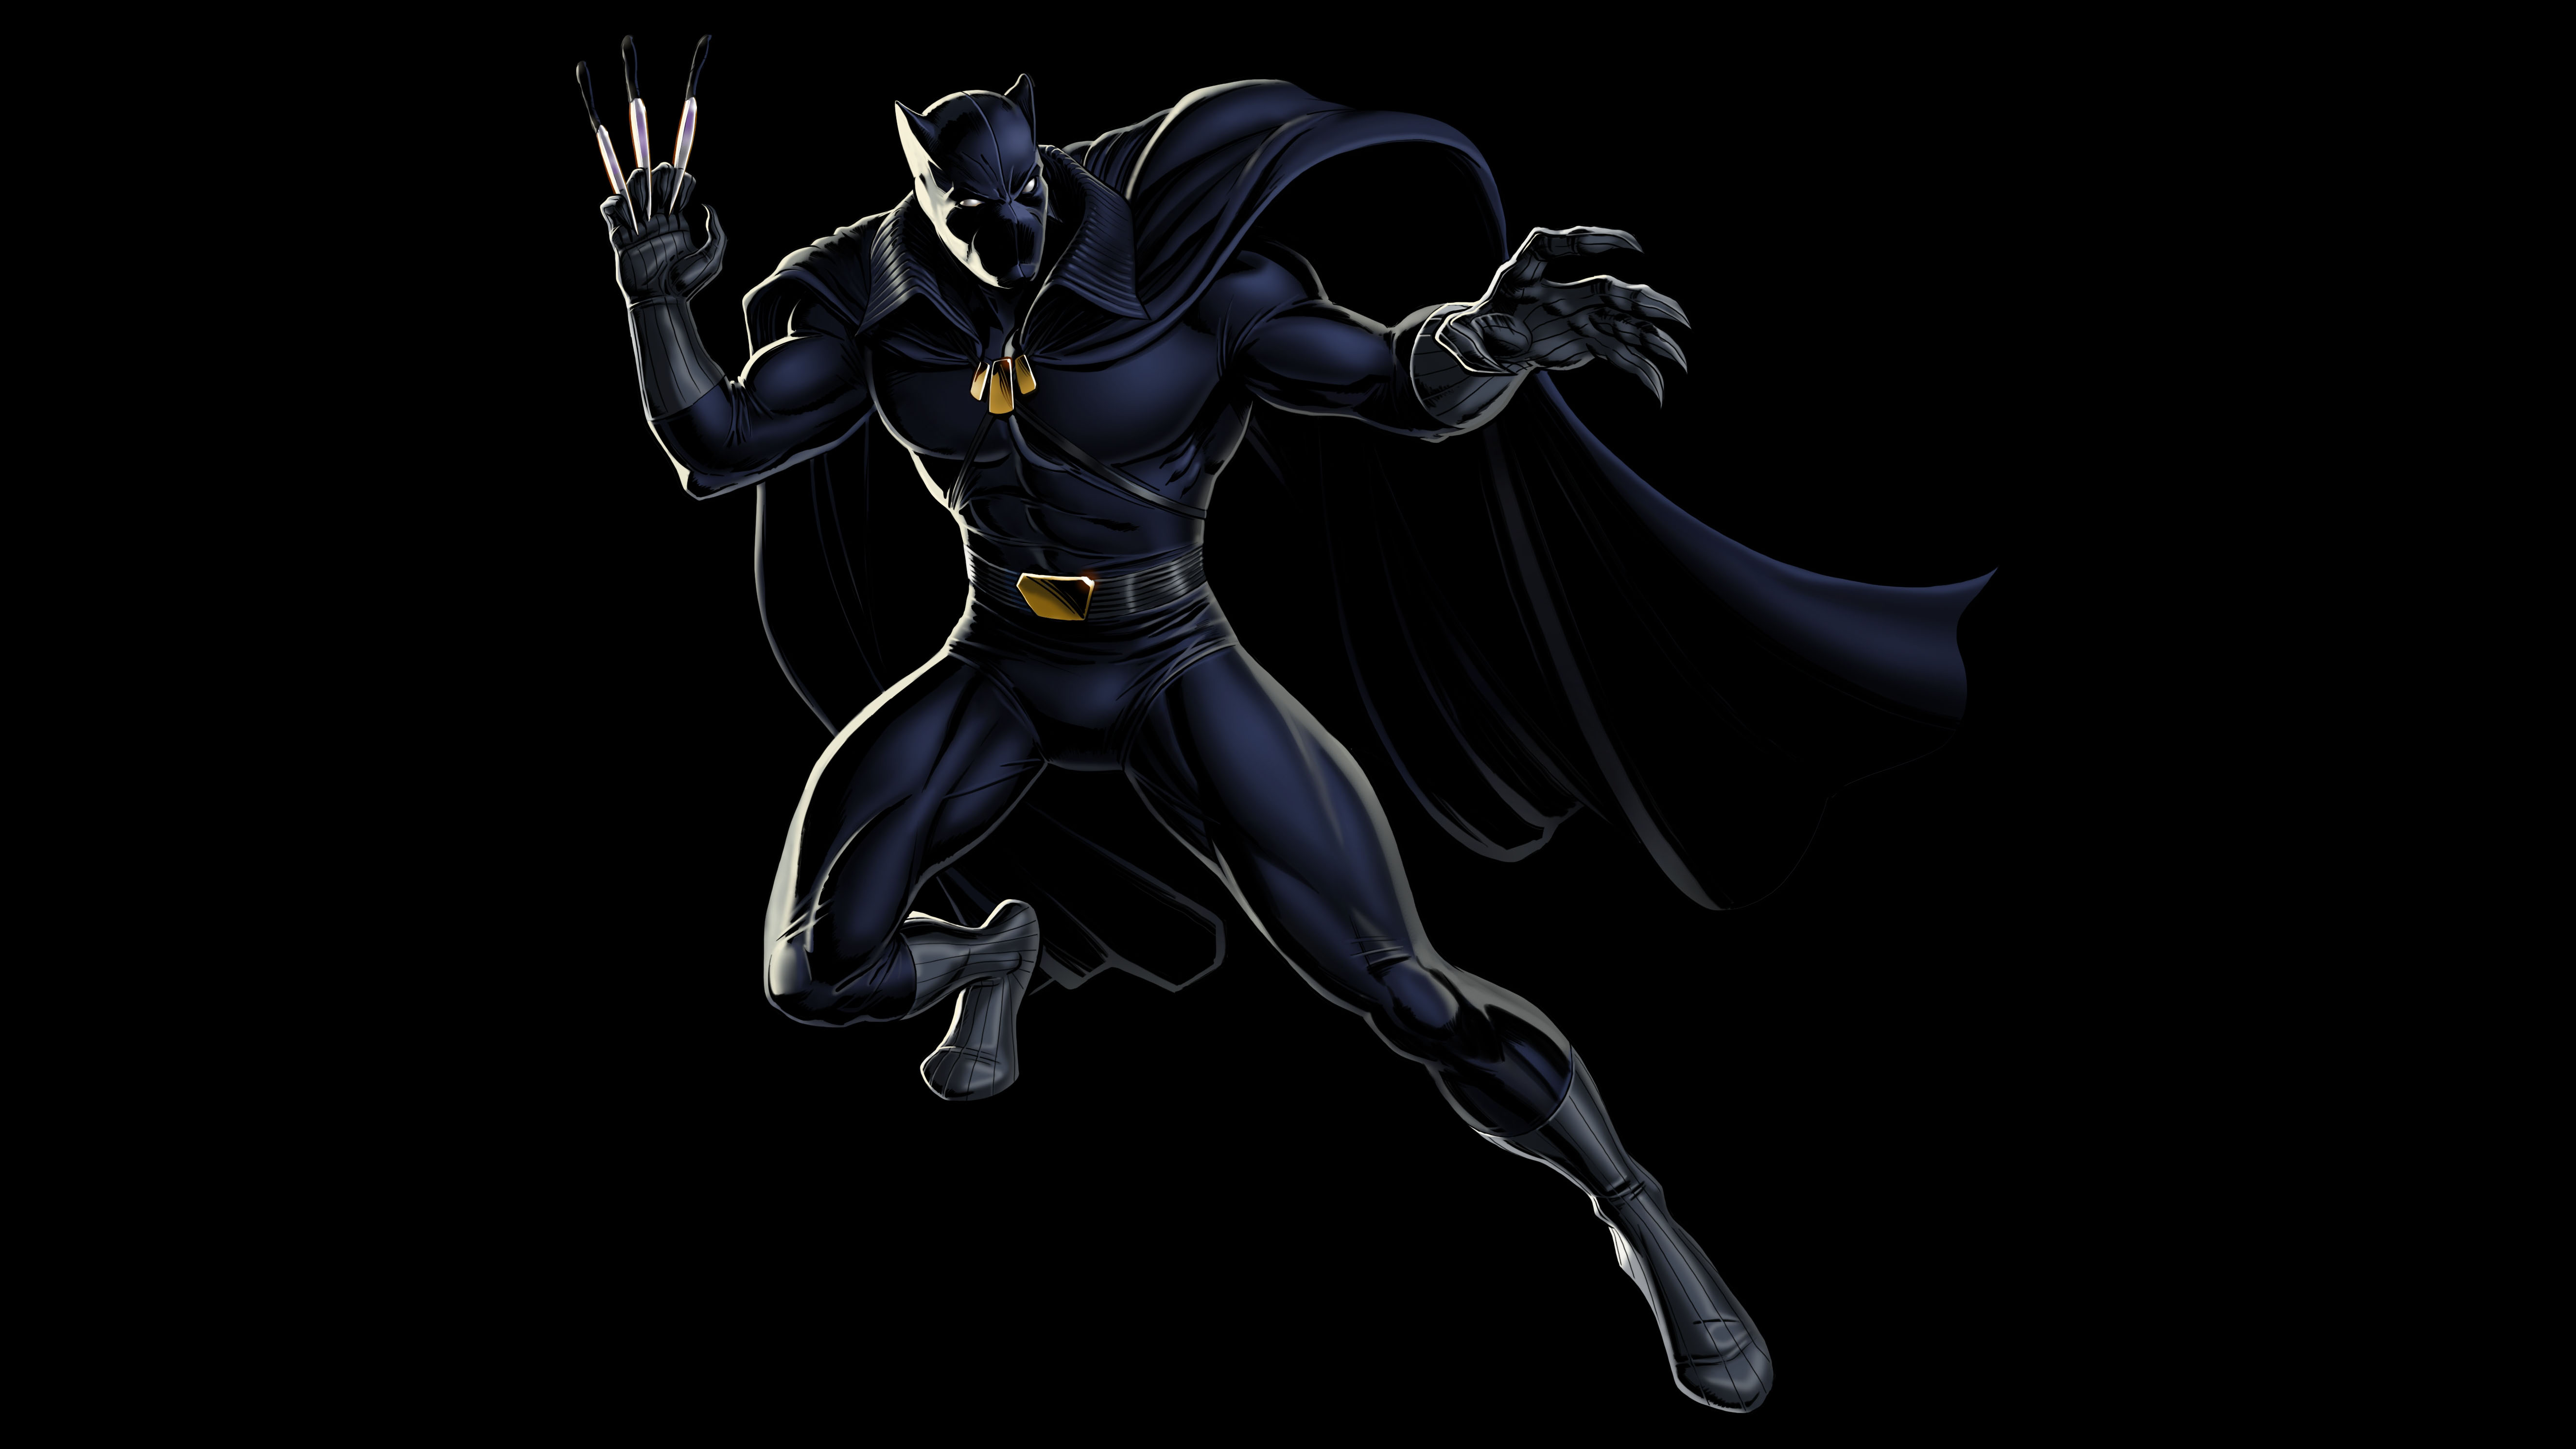 Comics   Black Panther Black Panther Wallpaper 5300x2981